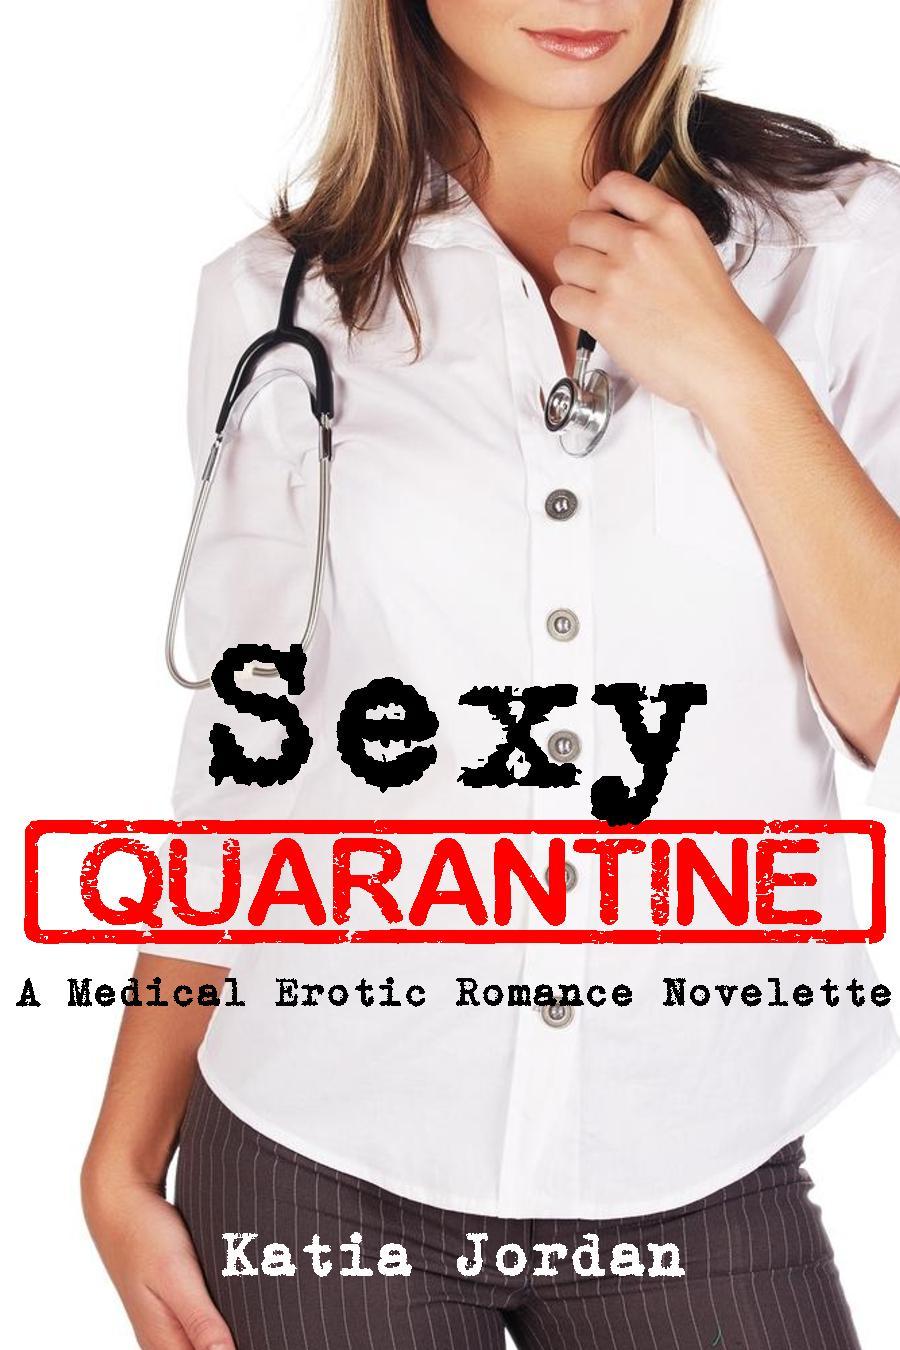 Sexy quarantine: a medical erotic romance novelette